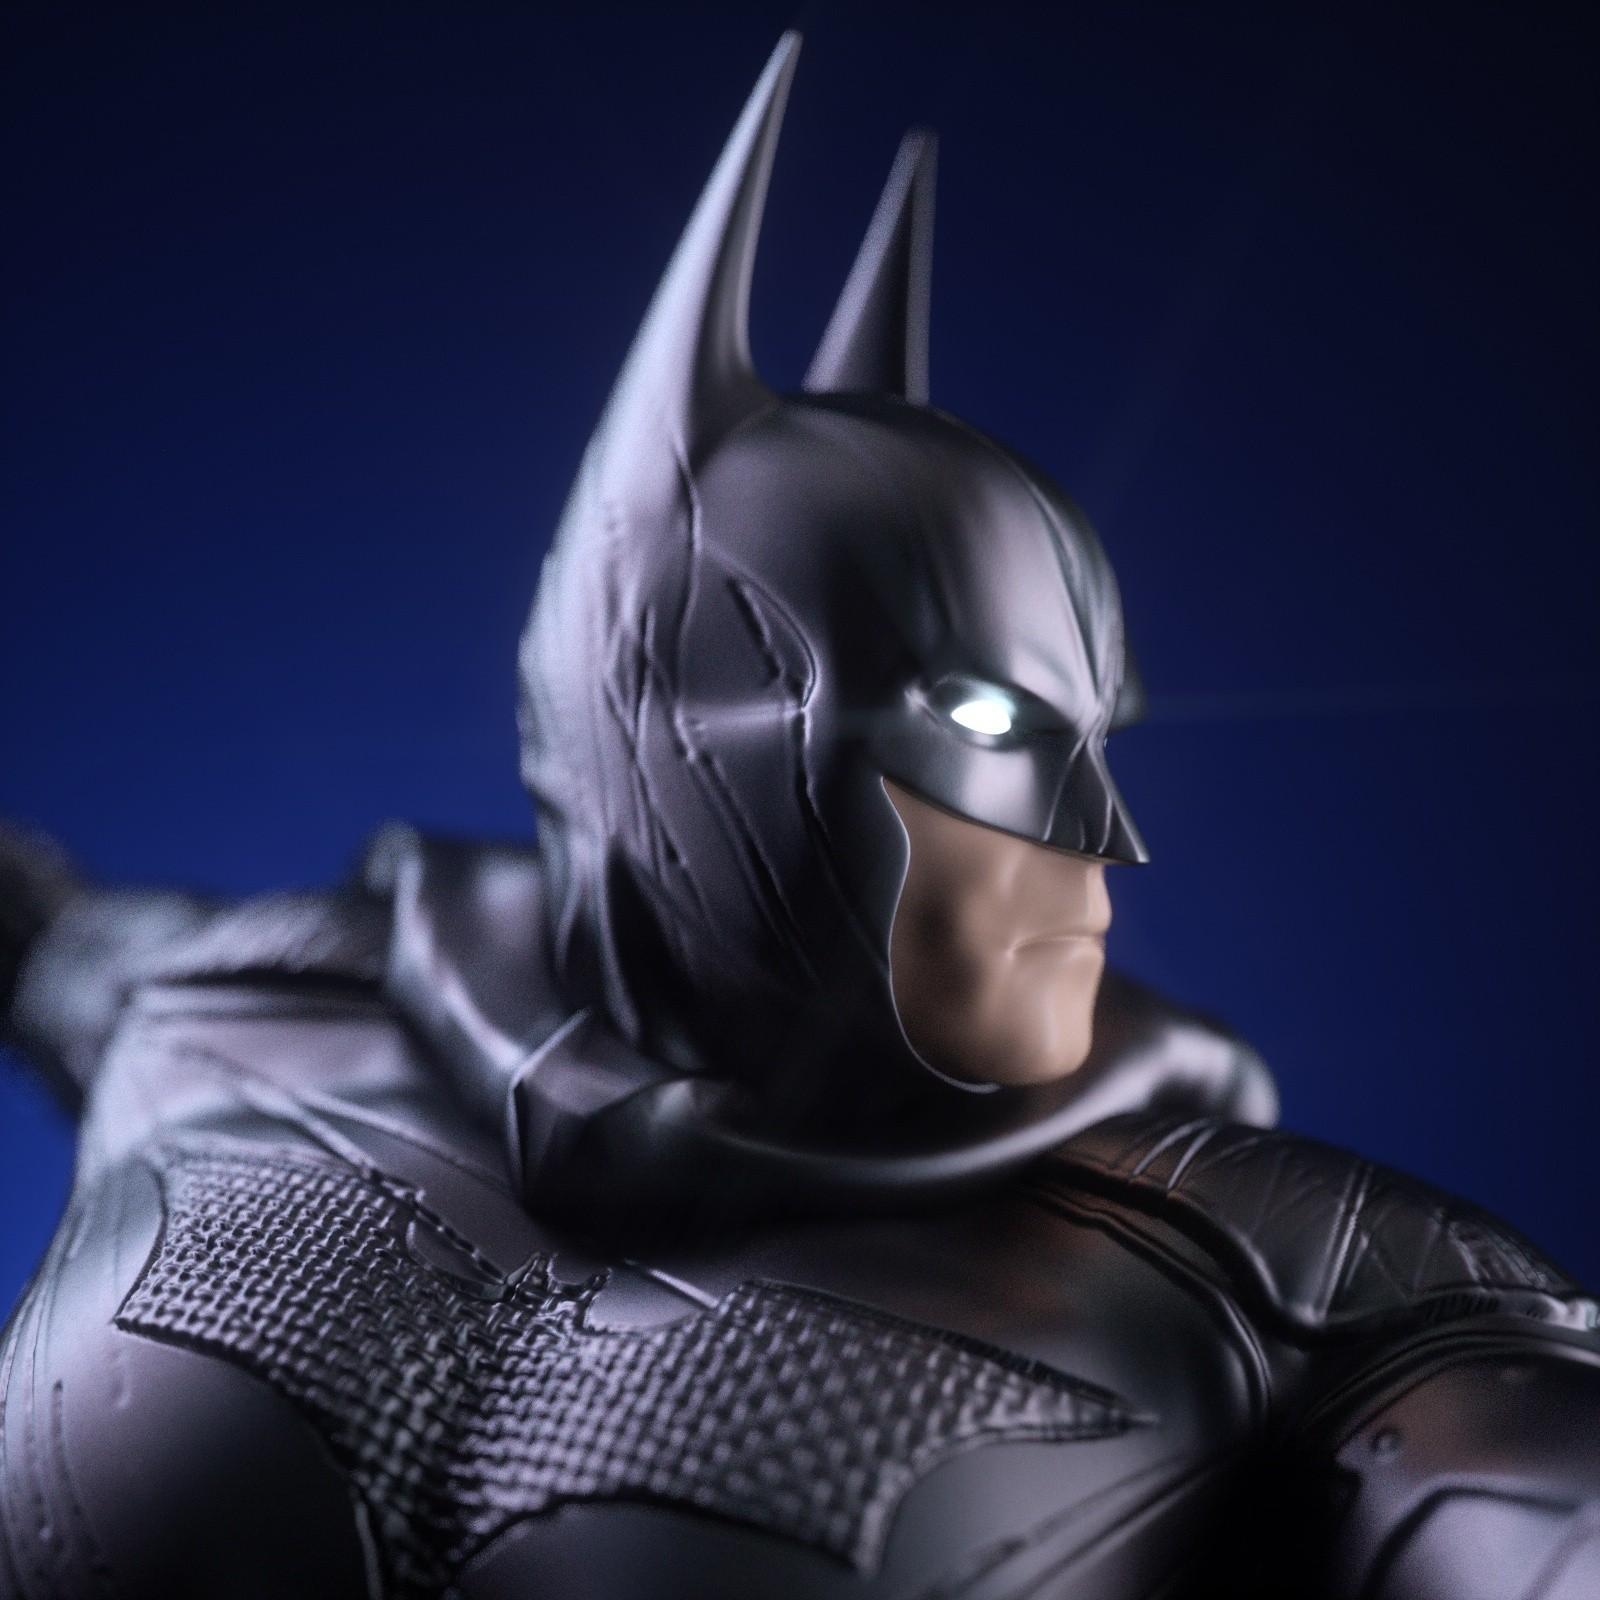 7.jpg Download OBJ file BATMAN Battle Pose • 3D print template, tolgaaxu